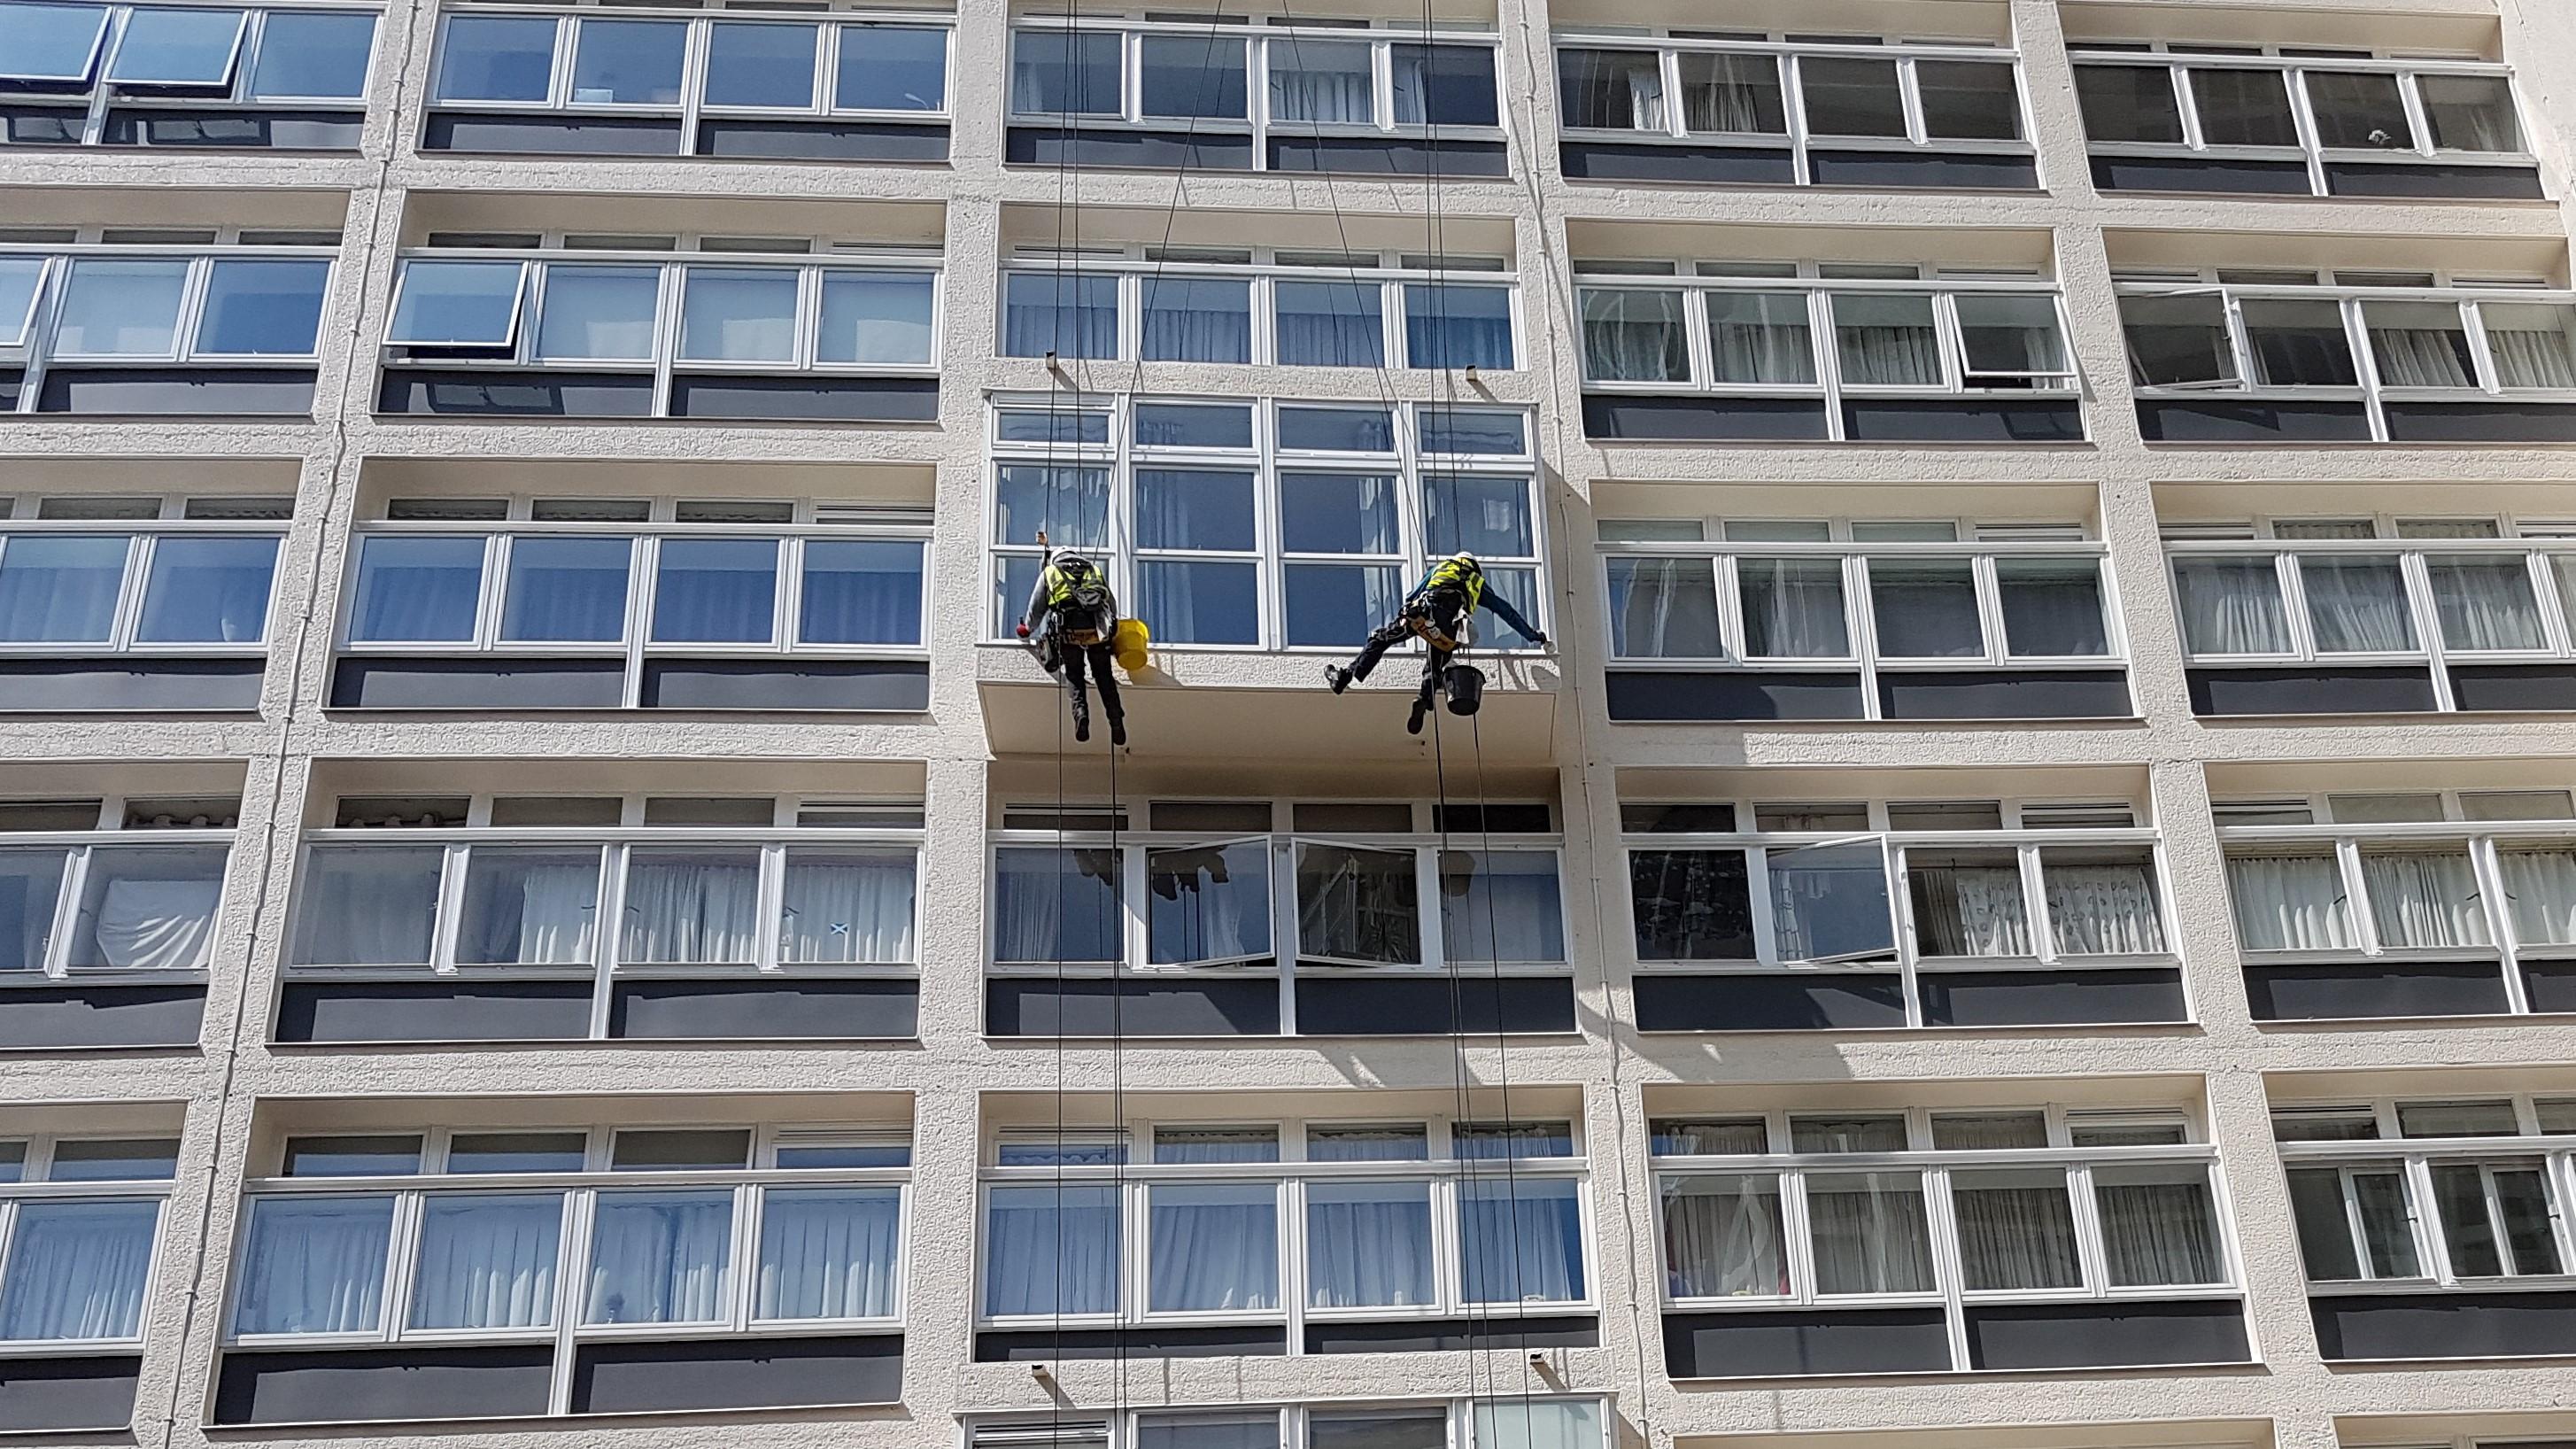 abseiling building painting repair